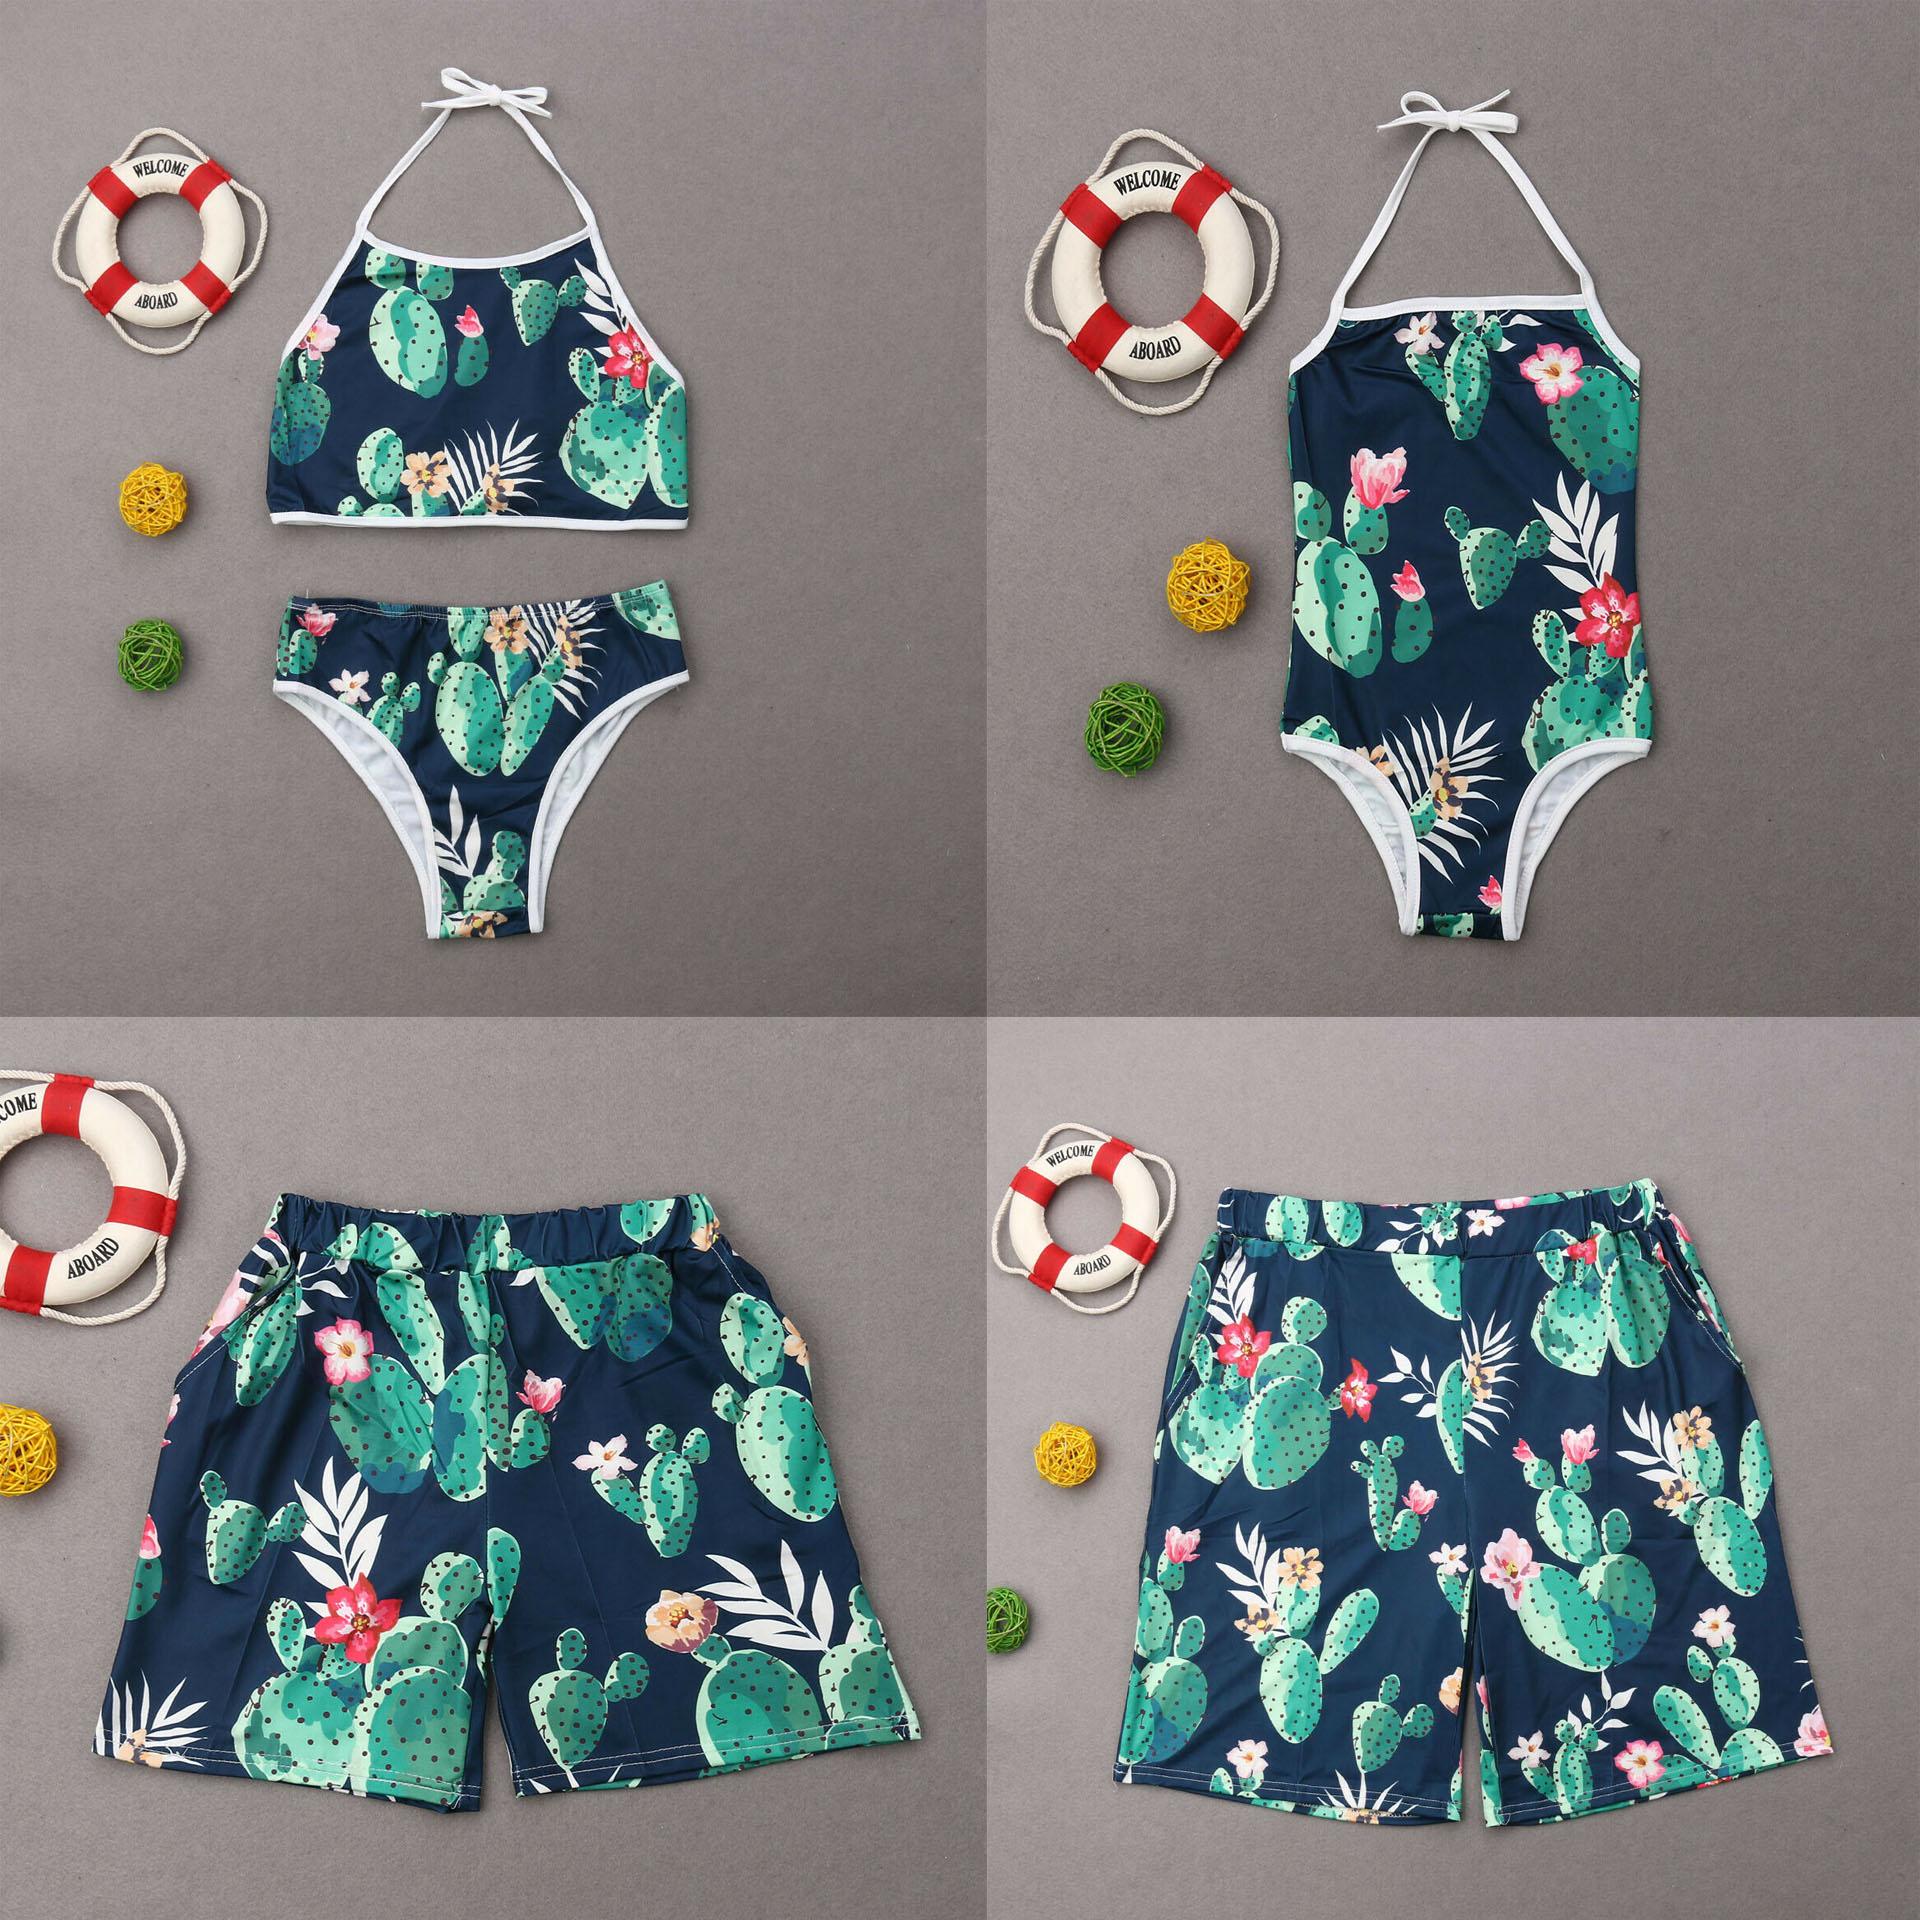 Family Swimsuits Matching Dot Print Parent Child Two Pieces Bikini Set Swim Trunks